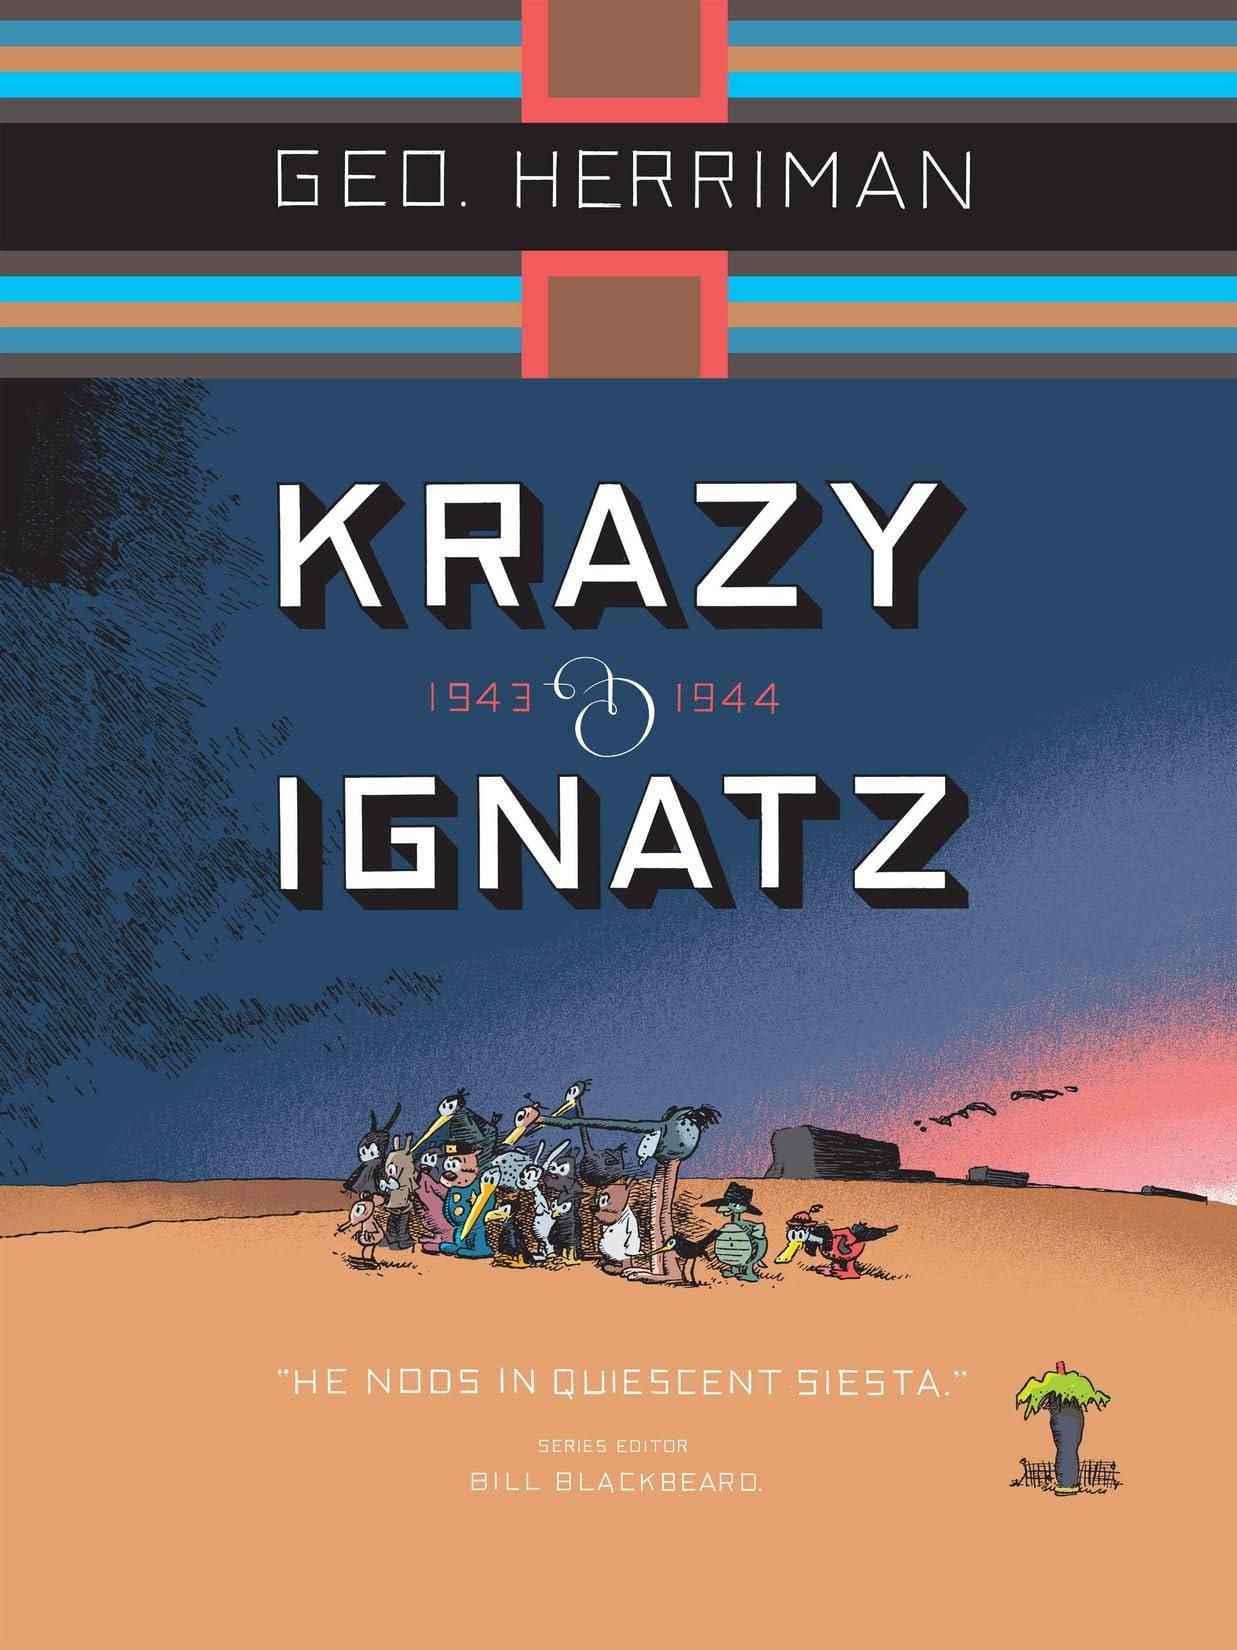 Krazy & Ignatz: 1943-1944 - He Nods in Quiescent Siesta